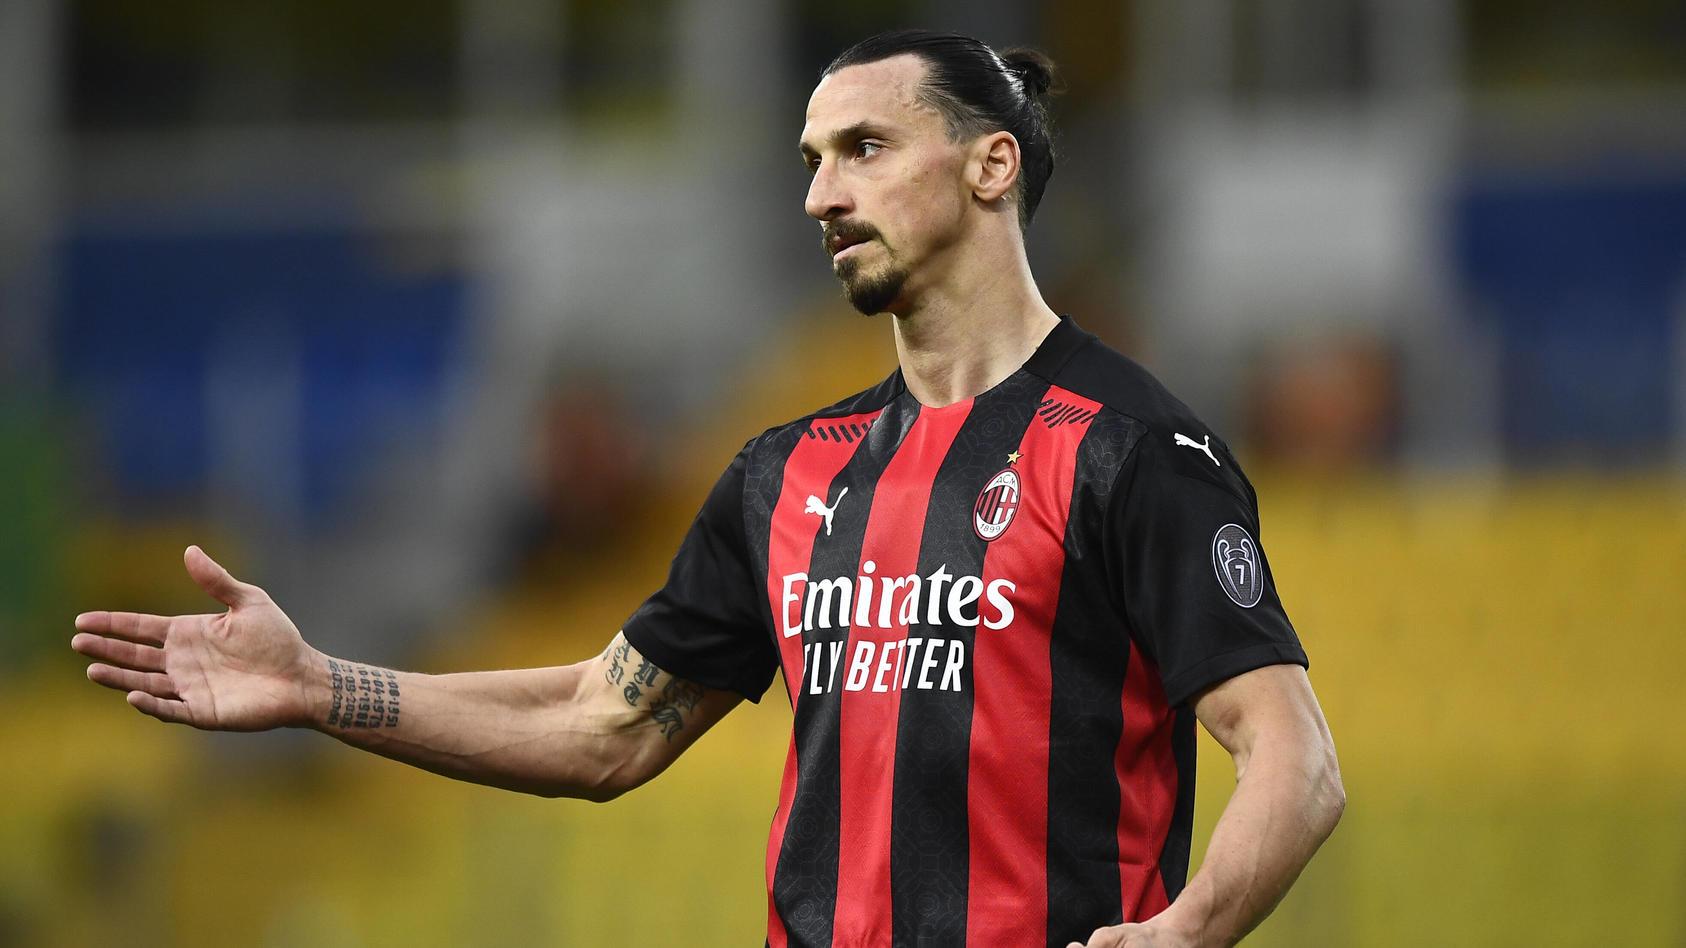 Zlatan Ibrahimovic im Trikot des AC Mailand